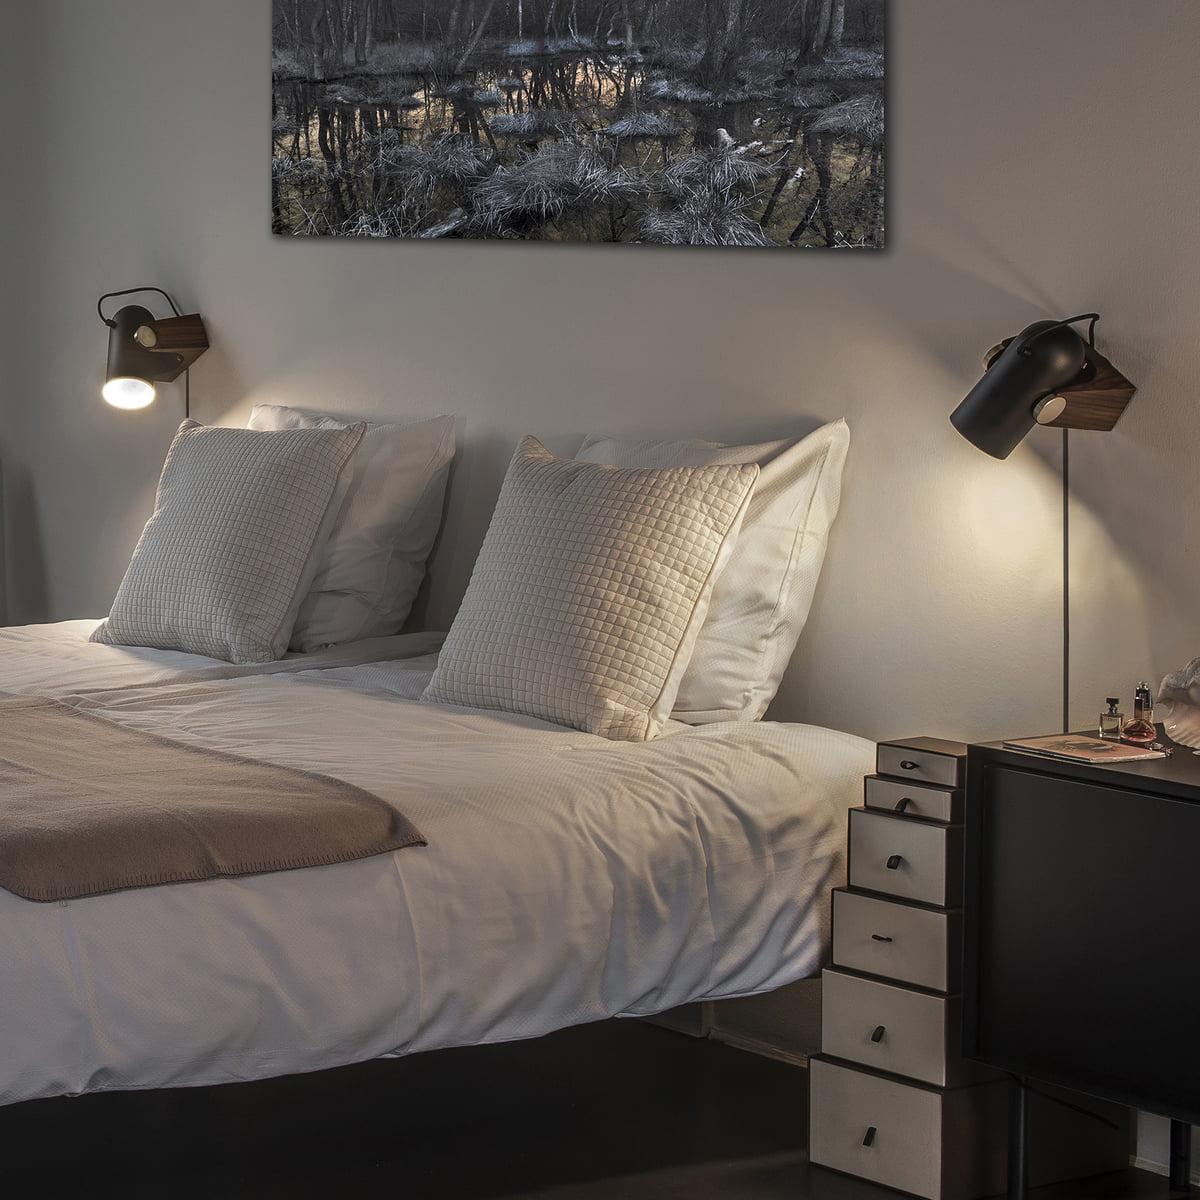 Terren Wandlampen | Terren Wandleuchte Bilder 24 Schlafzimmer Schwarz Gold Modern